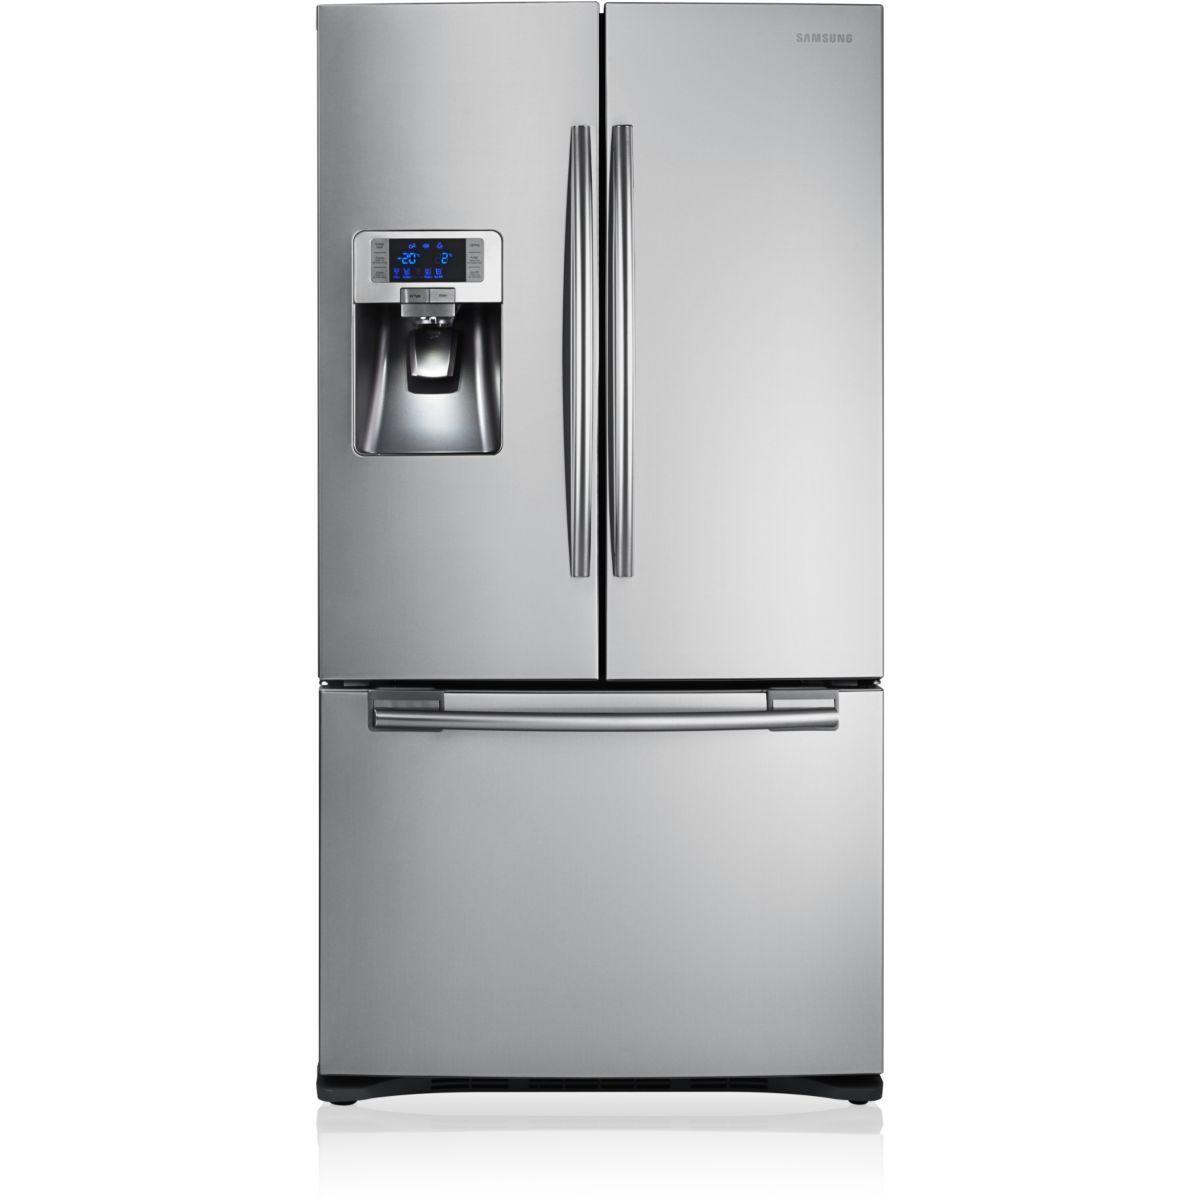 Refrigerateur Multi Portes Rfg23resl1 Taille Taille Unique Refrigerateur Americain Frigo 90 Cm Et Frigo Americain